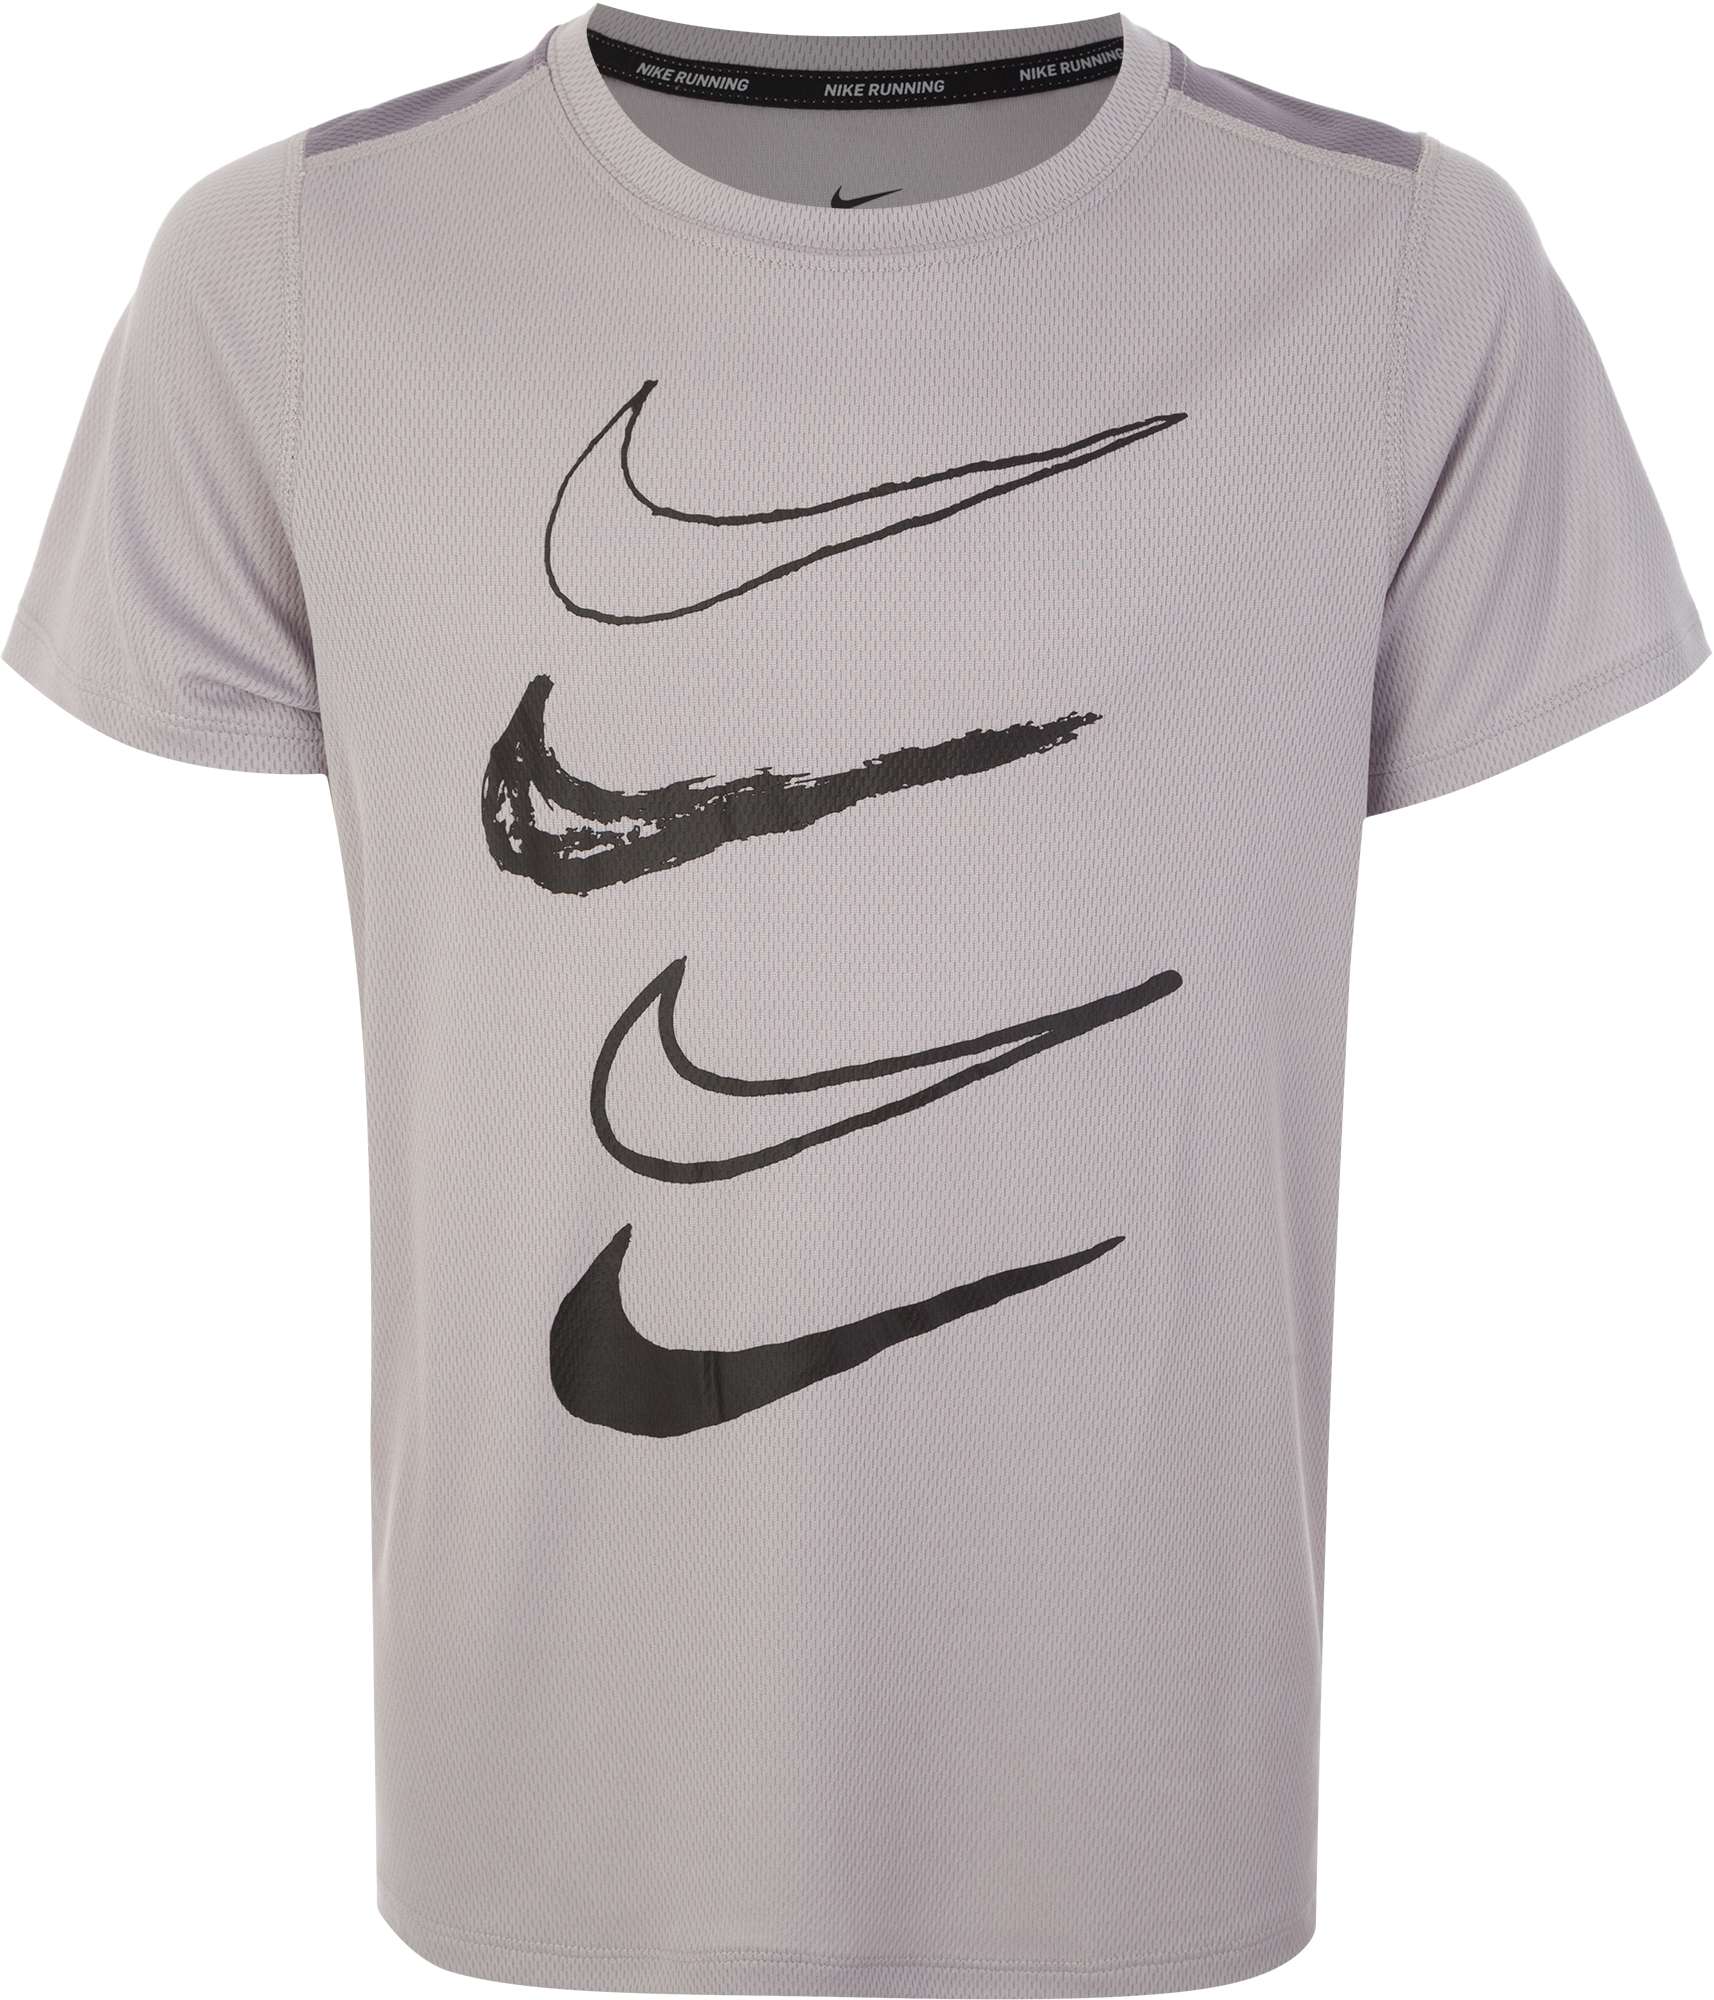 Nike Футболка для мальчиков Nike, размер 158-170